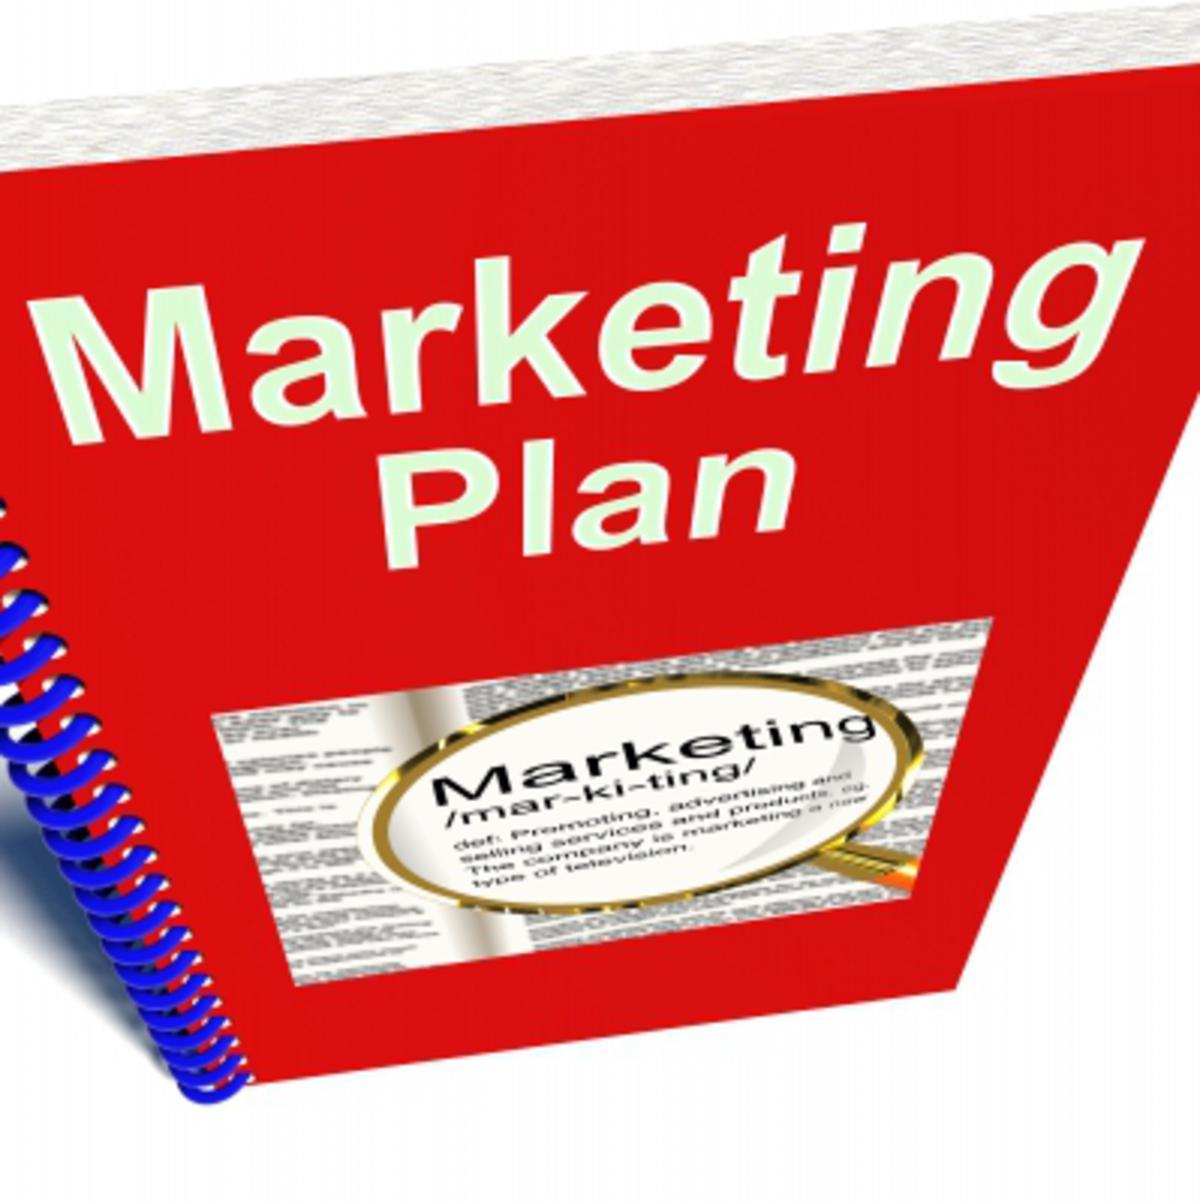 Introduction to Marketing Plans: Three Secret Marketing & Prosperity Strategies Revealed